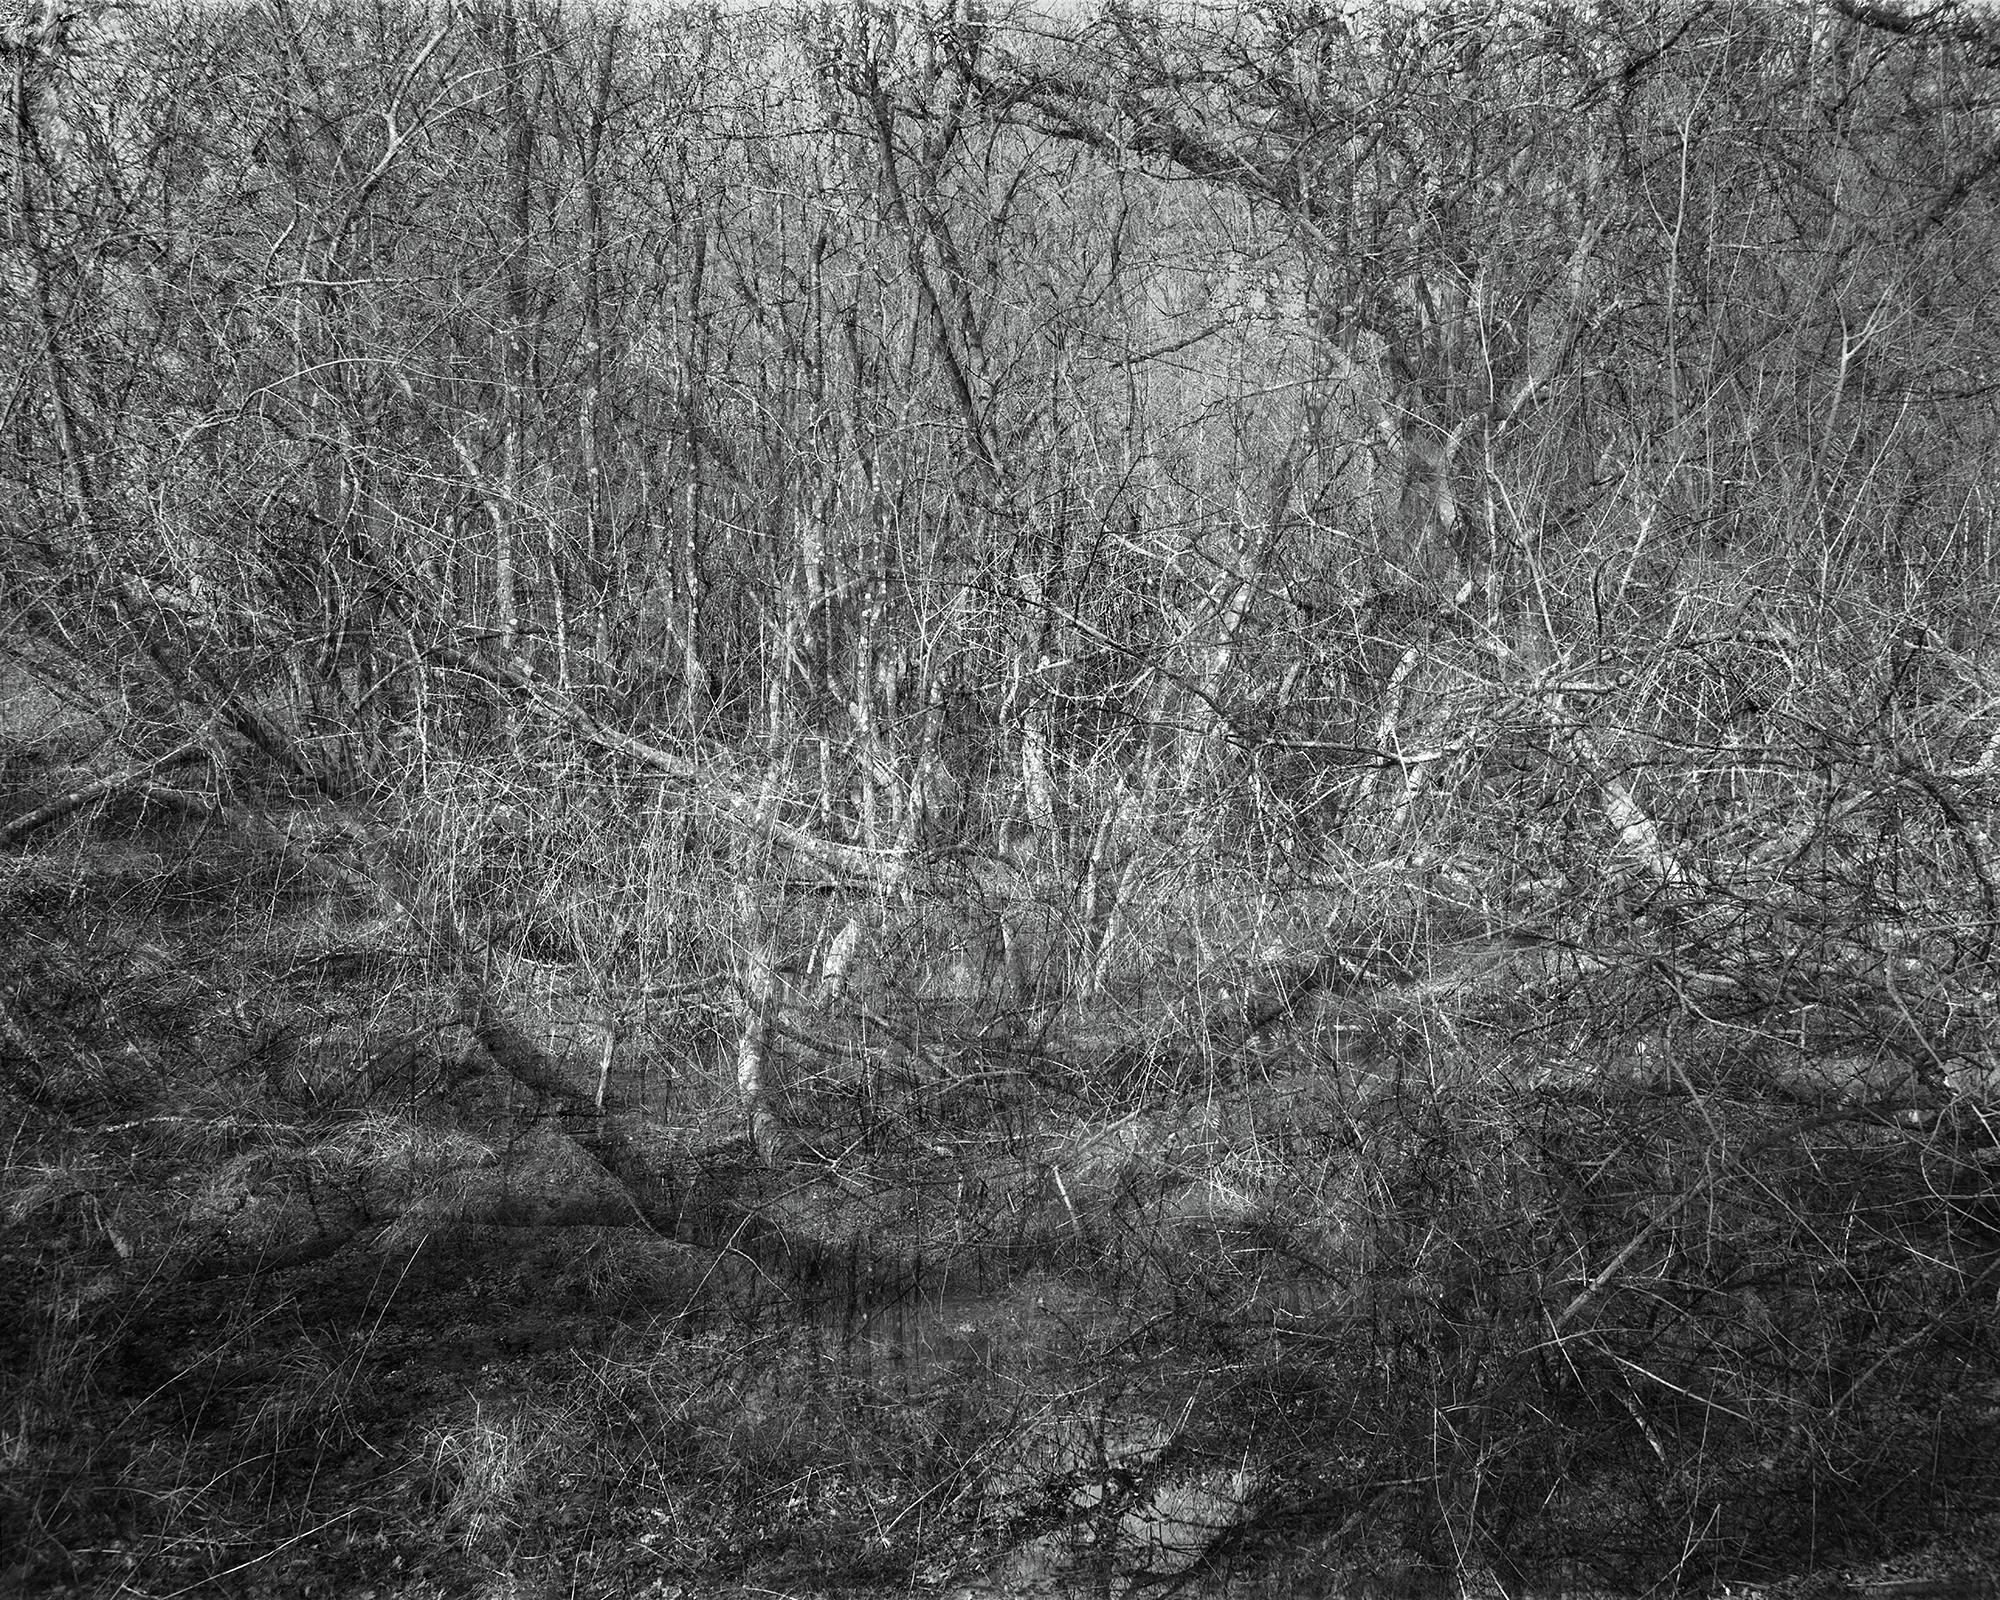 Photograph: Jonty Sale, 'SQUALLSMIRE #5'